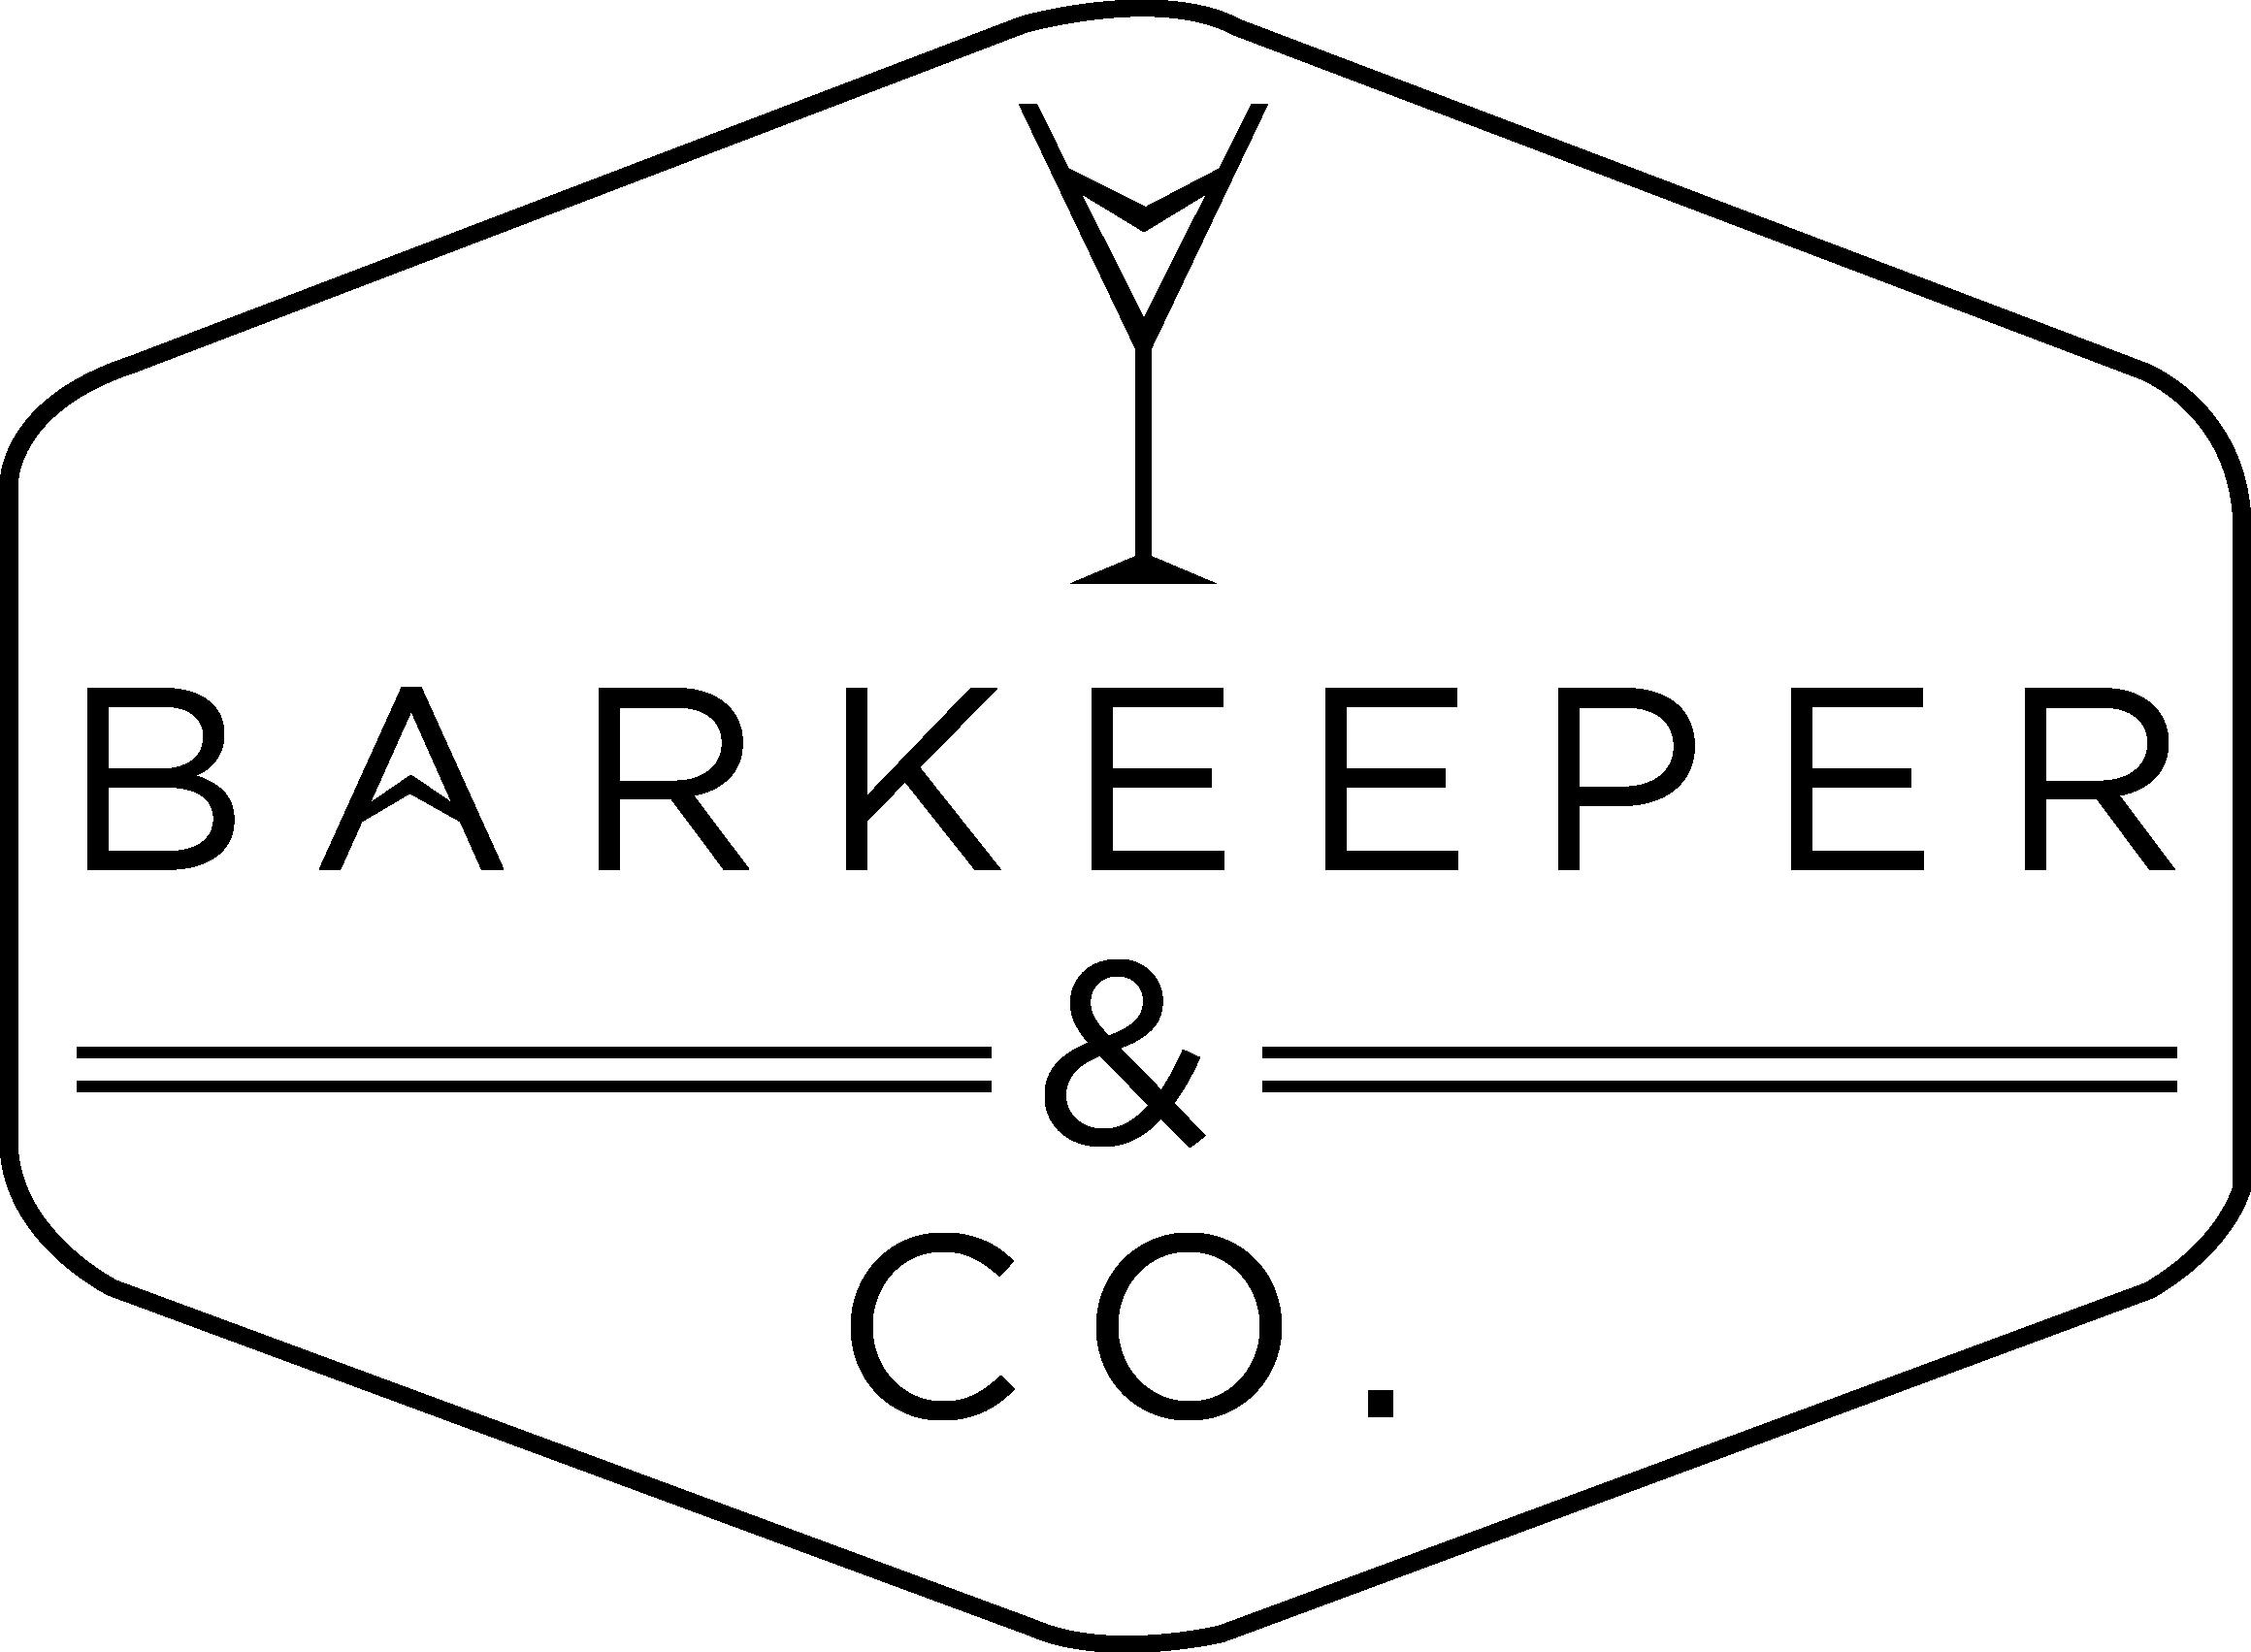 Logo Design by Lagadic Florian - Entry No. 177 in the Logo Design Contest Artistic Logo Design.